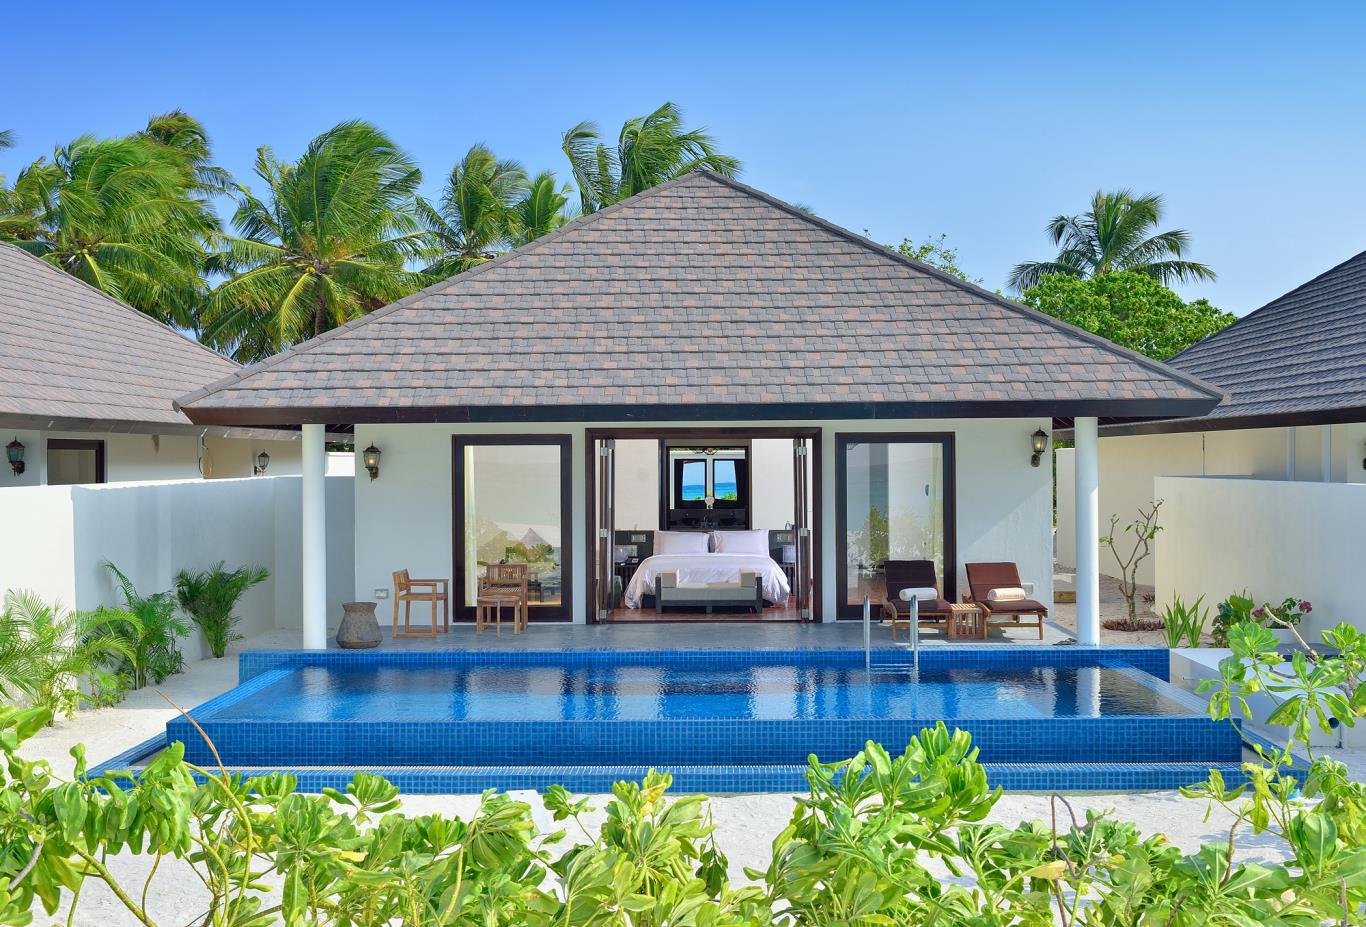 Sunset-pool-villa-exterior-pool-and-villa-interior